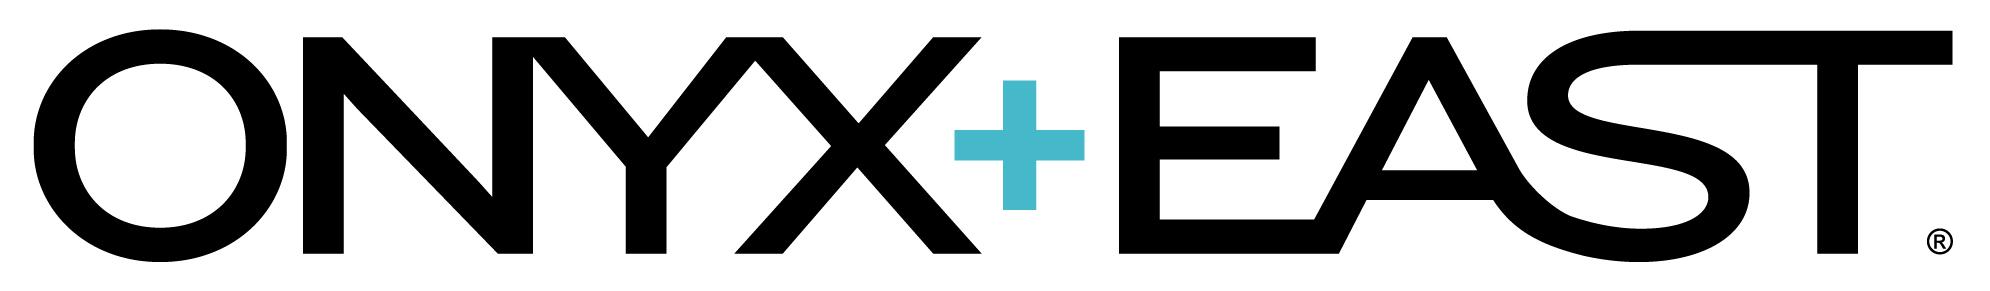 Onyx+East-logo-CMYK-01.jpg